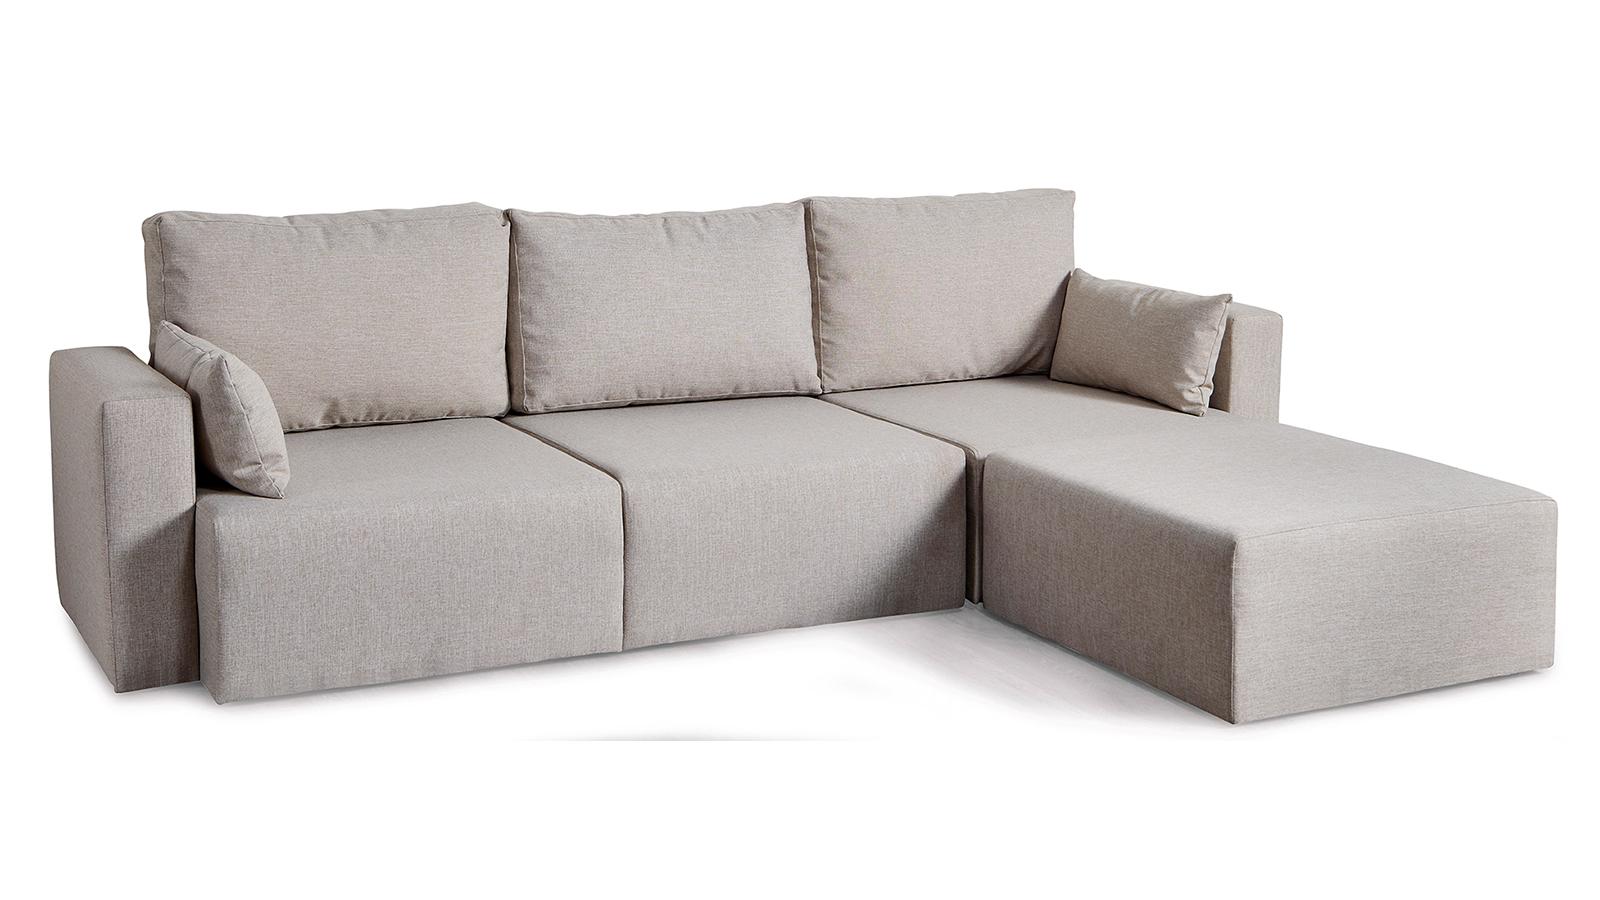 Multimo Sofa 3-Sitzer mit Sitzhocker & Kissen Royals